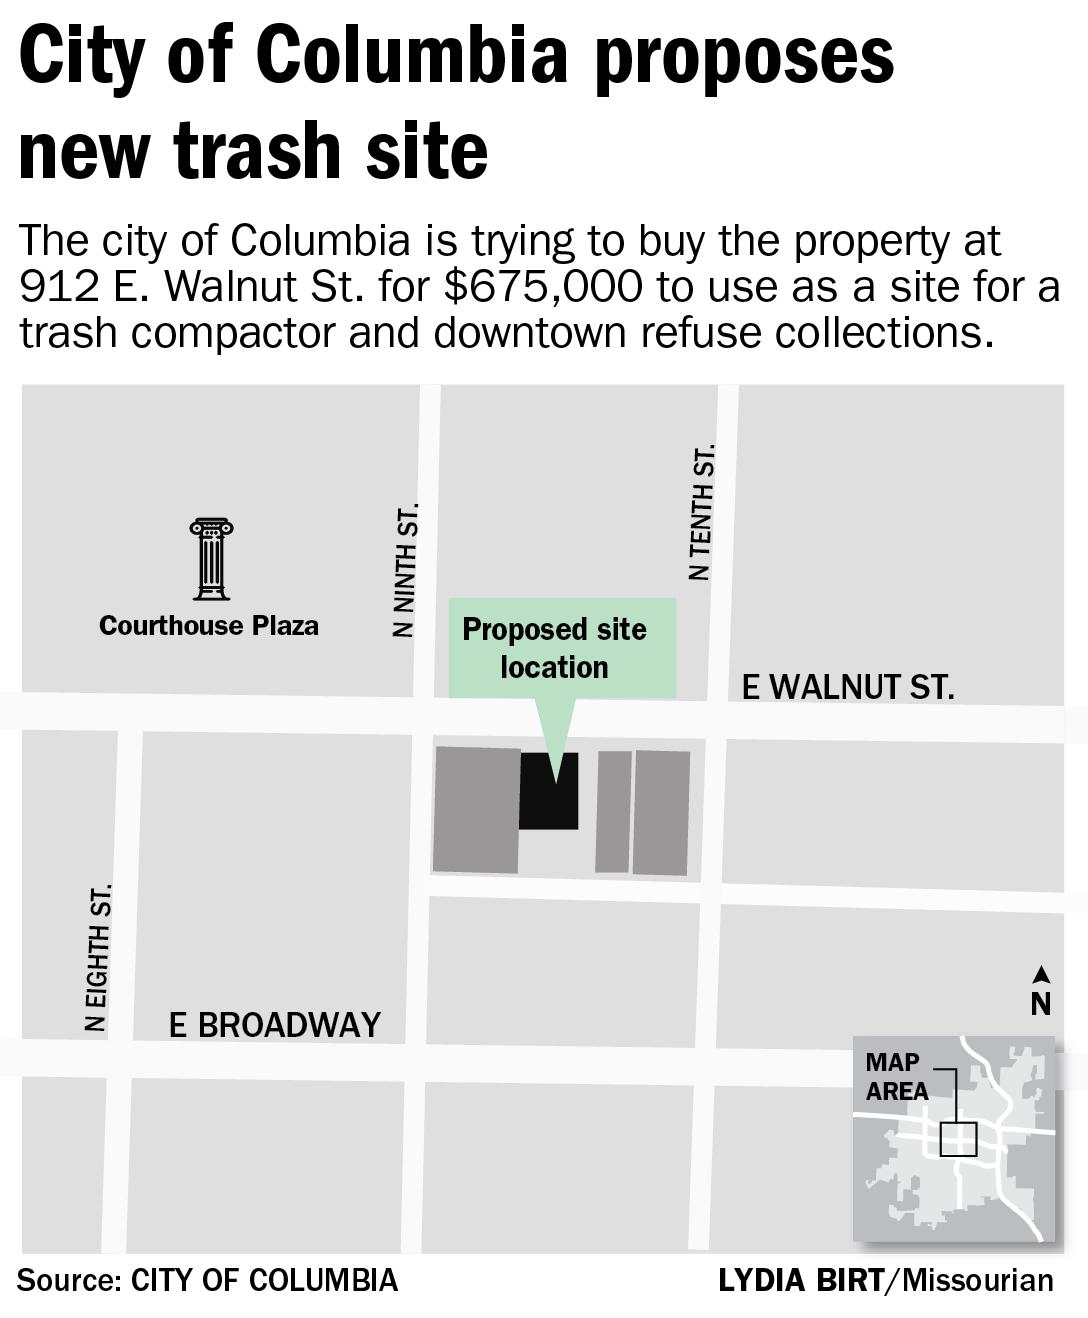 City wants to buy, convert Walnut Street property to trash